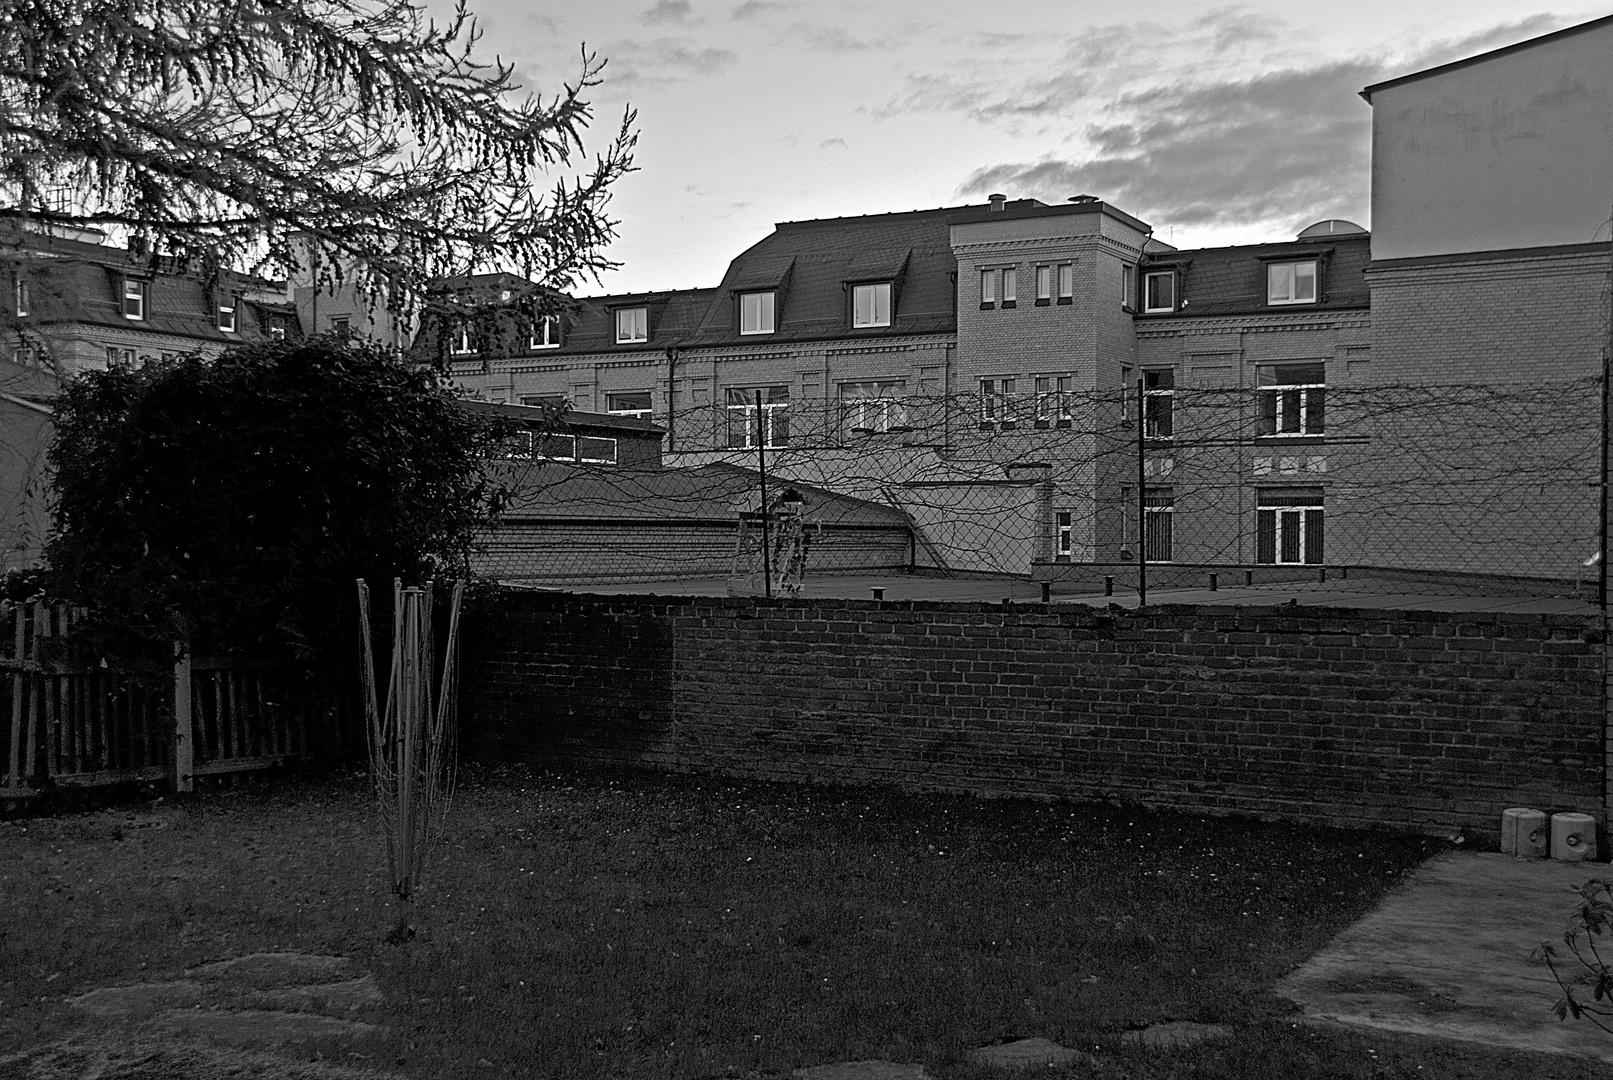 Hinterhof-Romantik